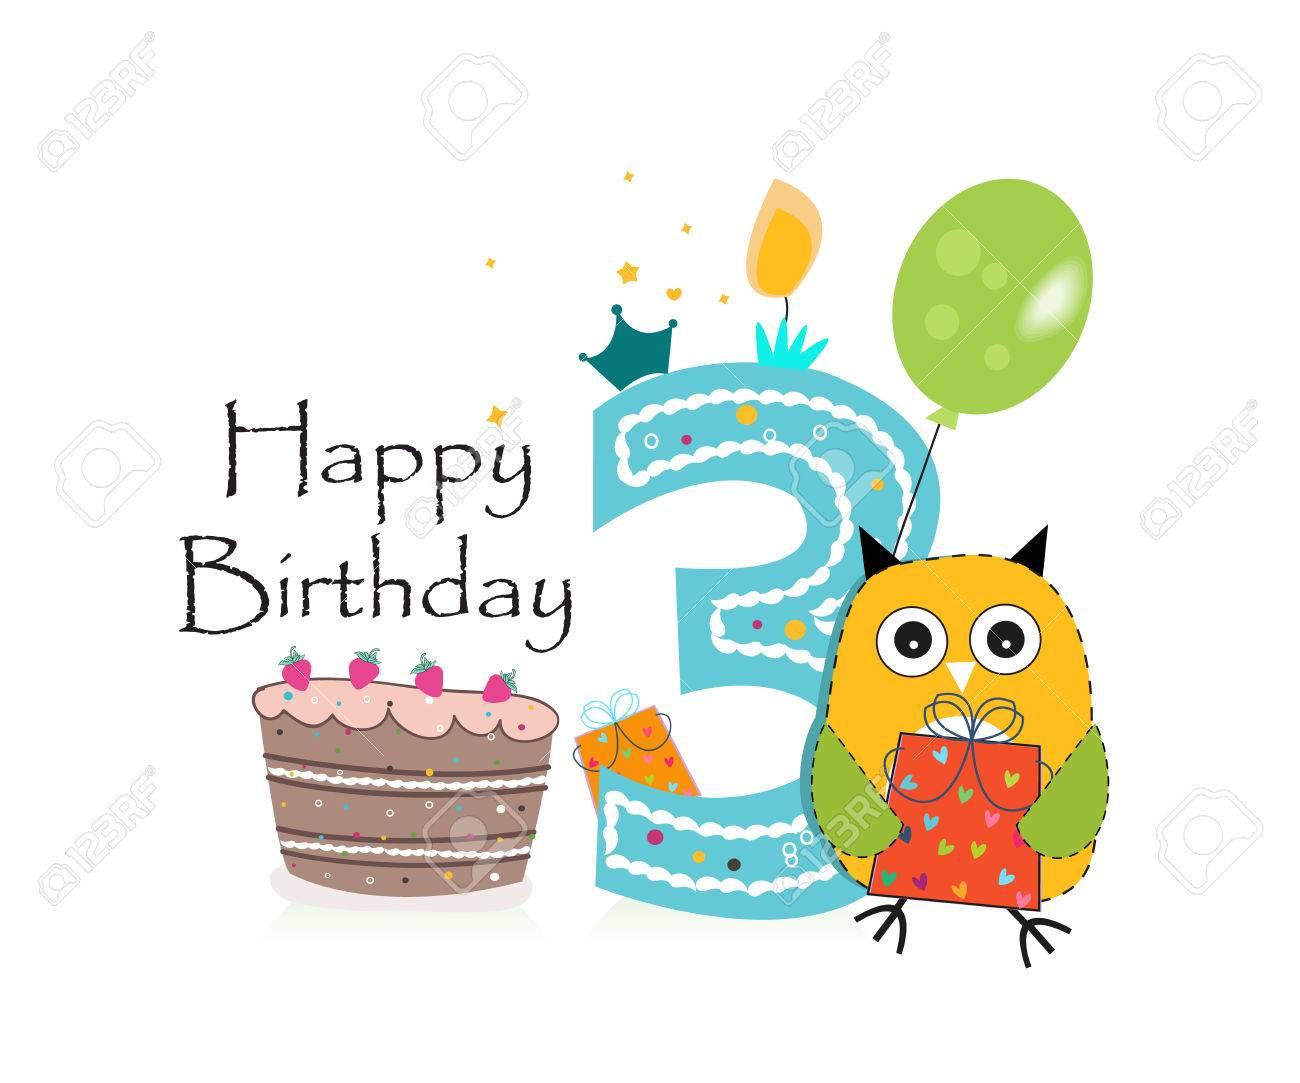 Third Birthday Greeting Card Cute Owl Balloon And Birthday